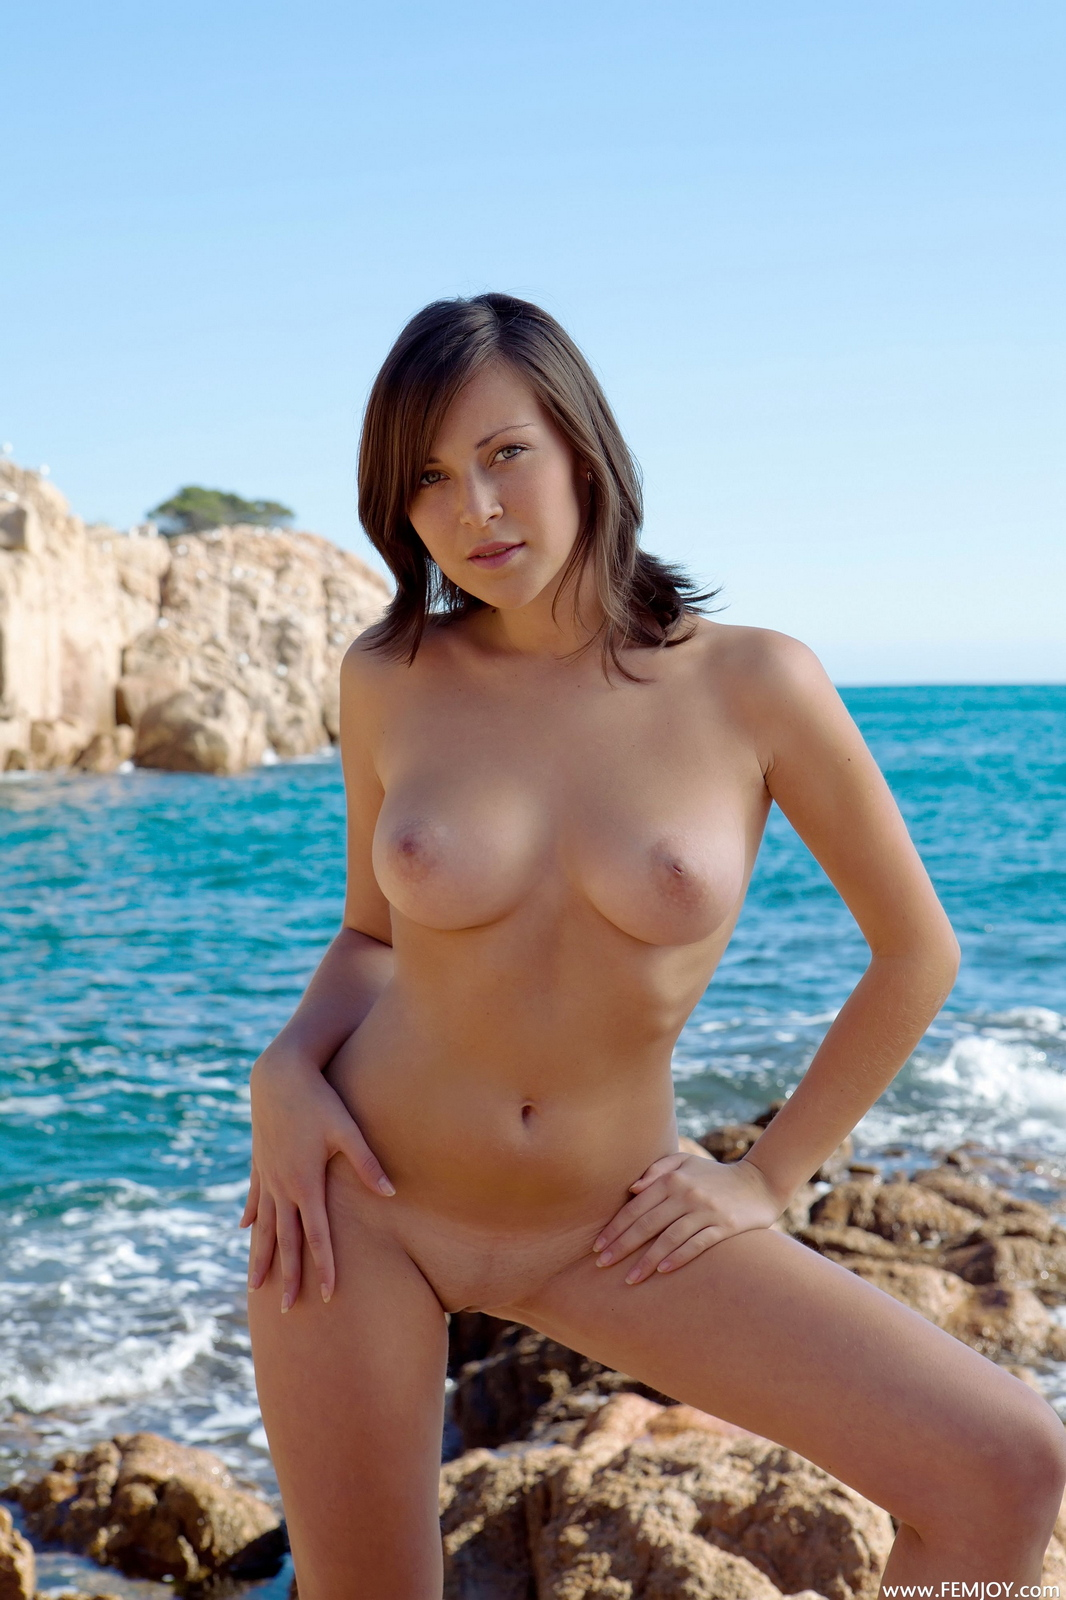 sophia-h-seaside-naked-boobs-rocks-femjoy-24